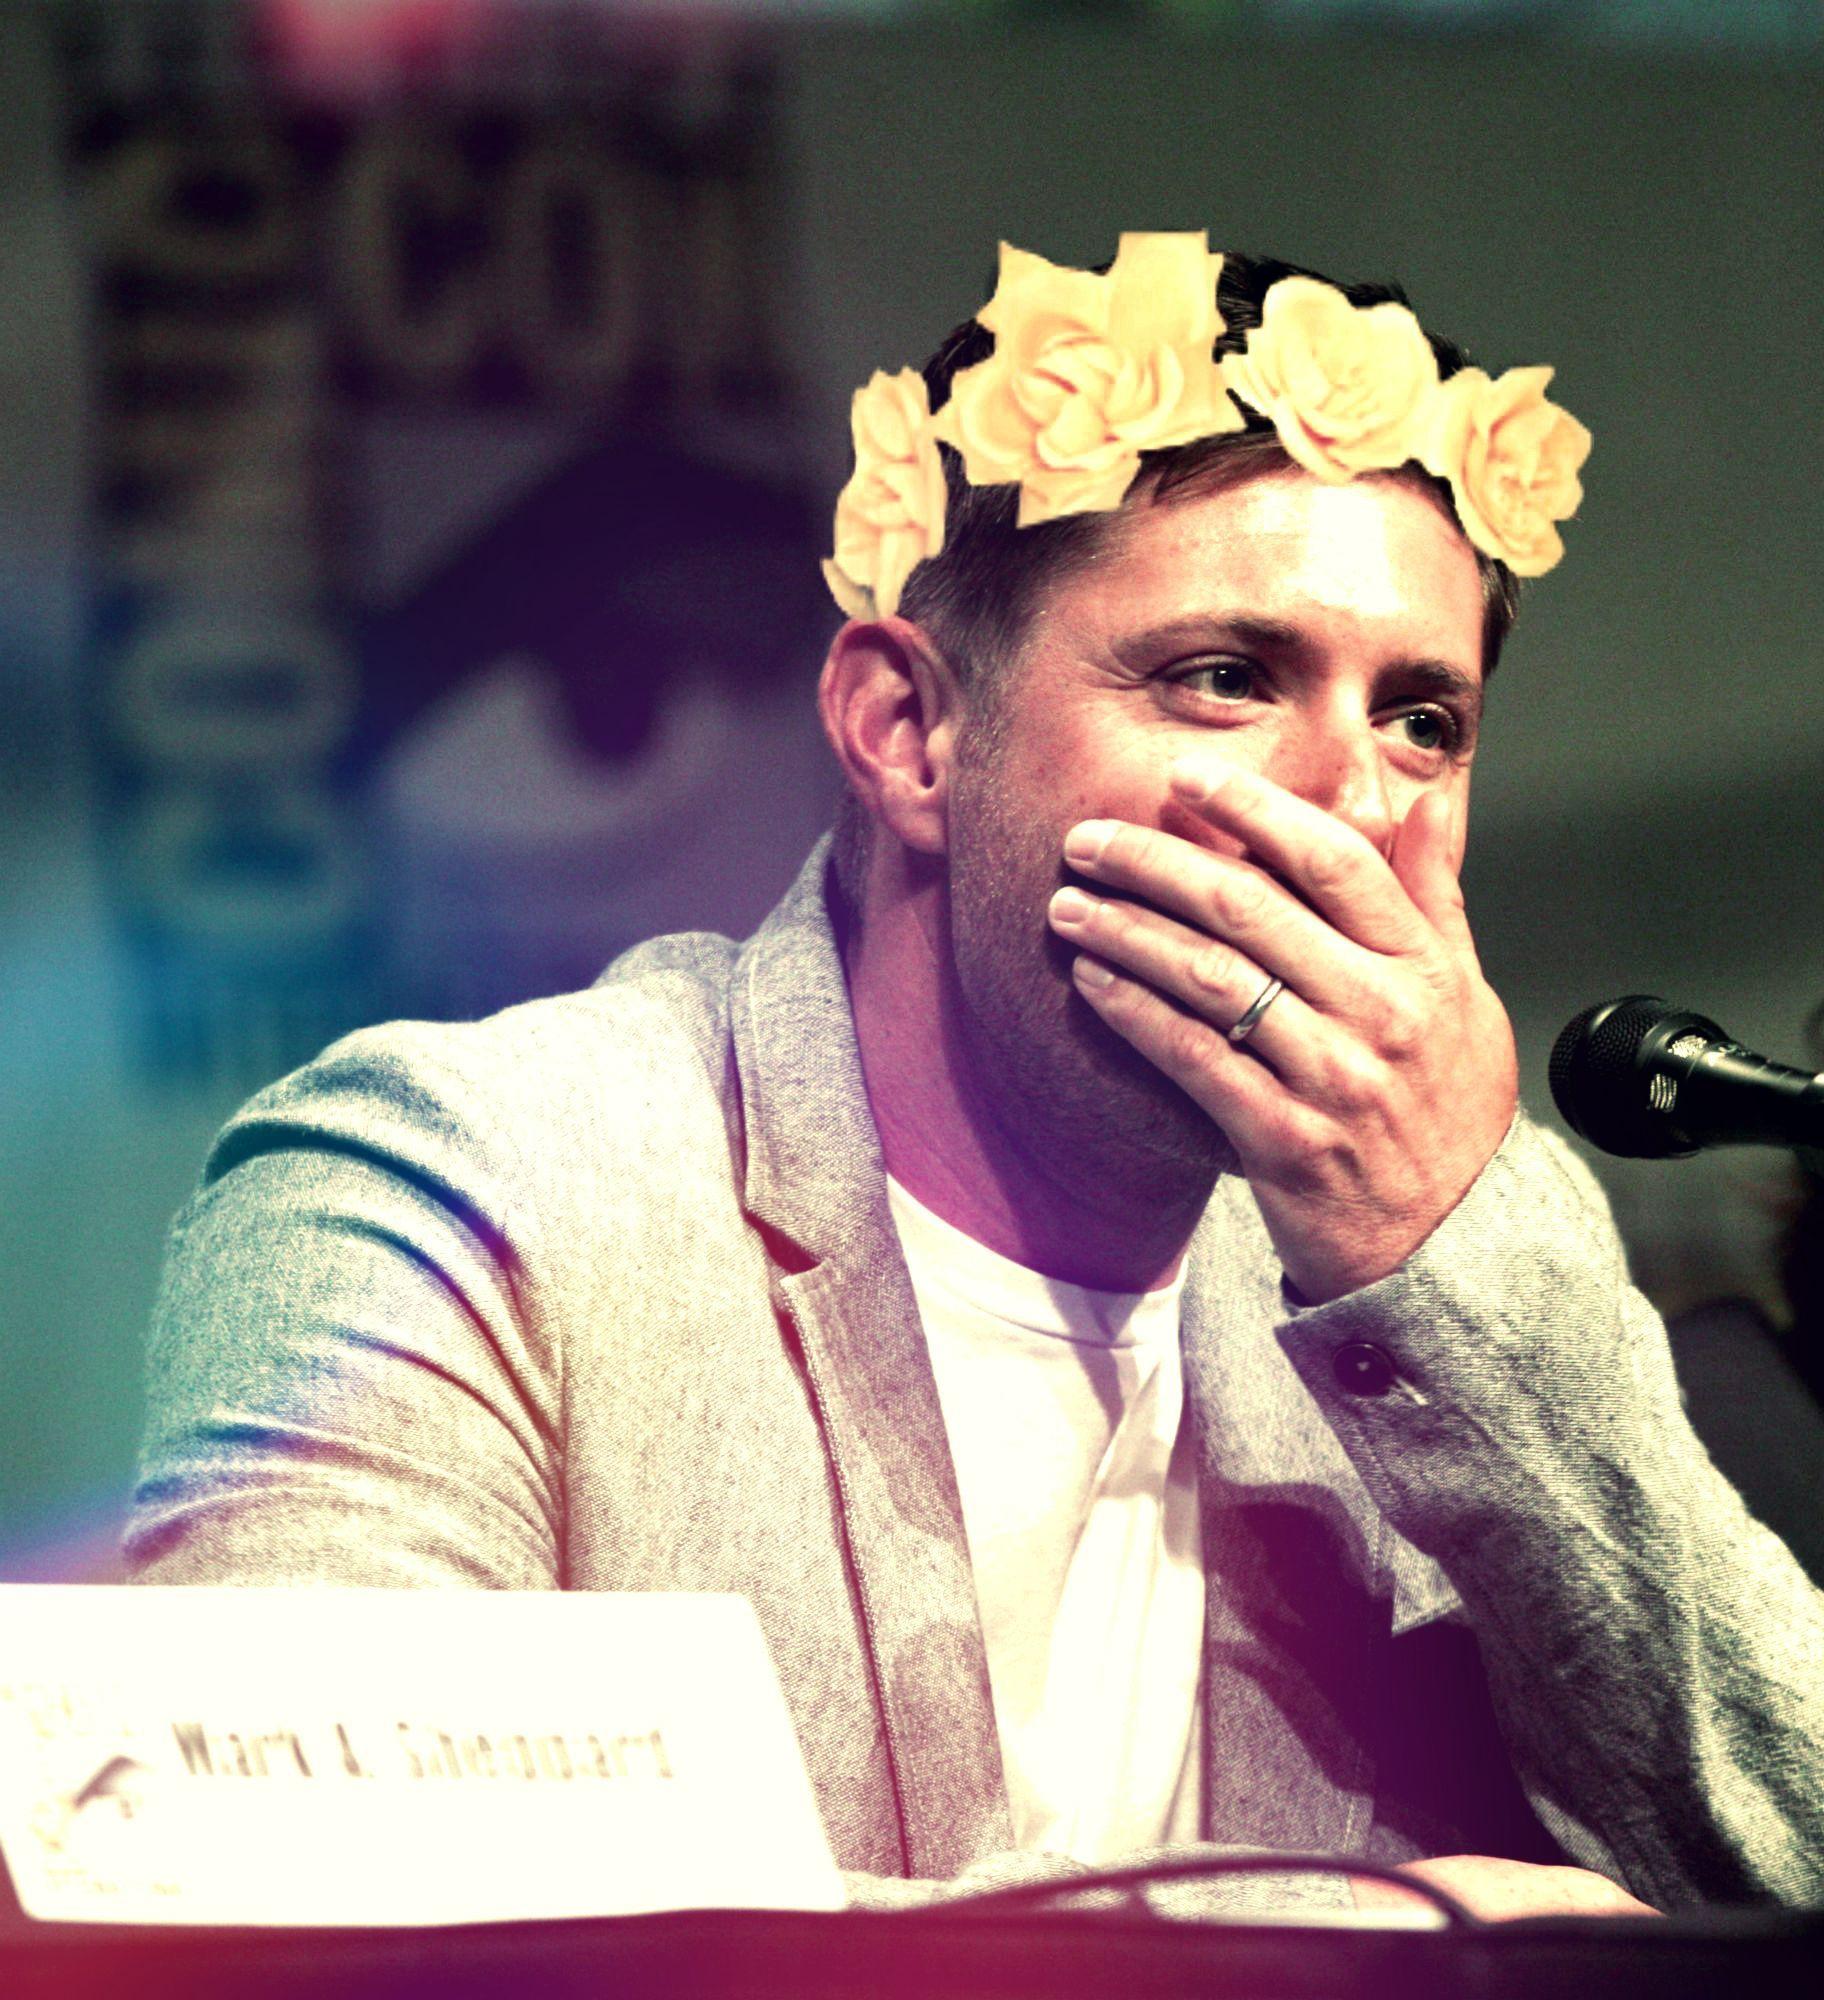 Supernatural Jensen Ackles Comic Con Flower Crown Flower Crowns